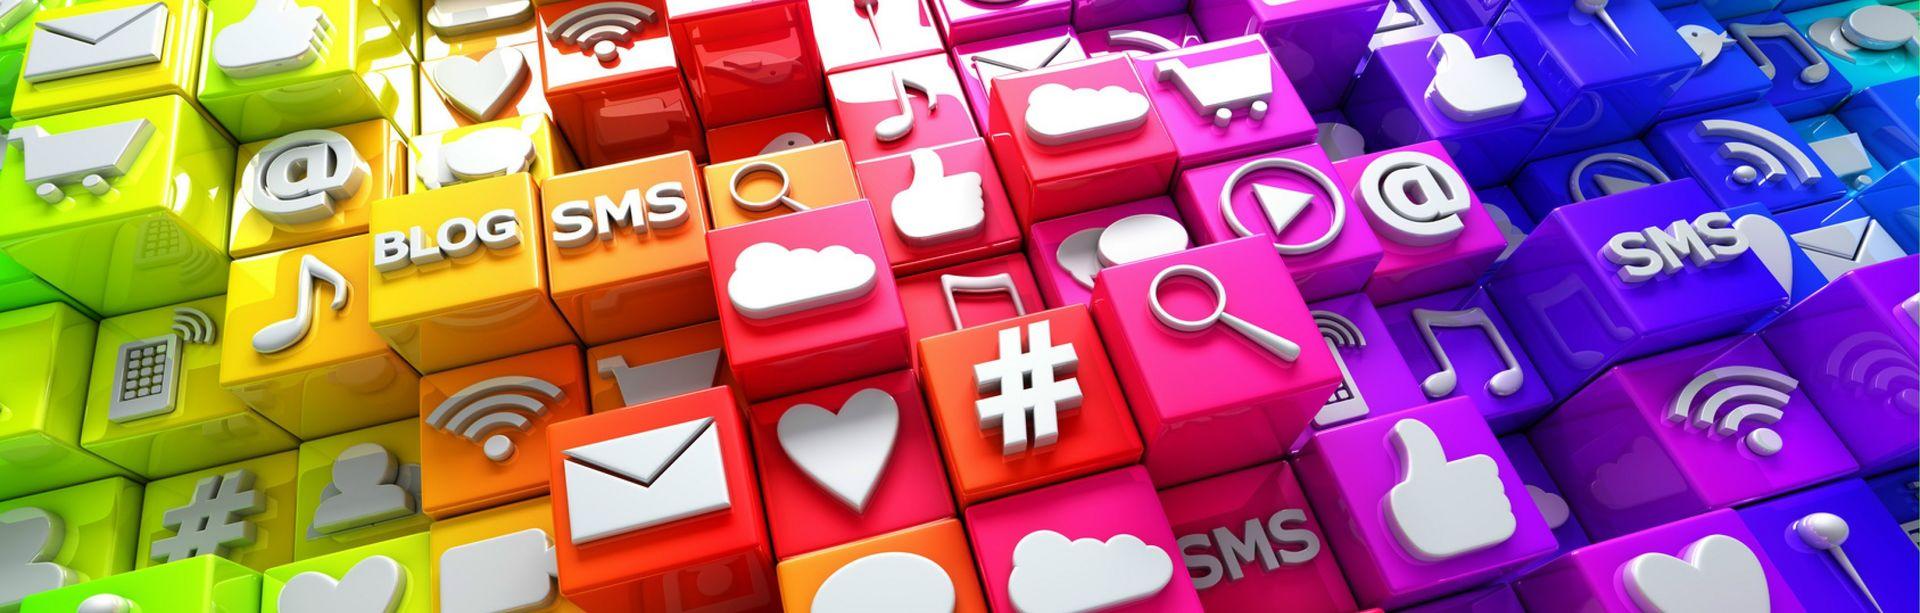 semiar-social-media-marketing-essentials-training-course-workshop-trash-media-digital-marketing-communications-pr-advertising-agency-ferndown-bournemouth-dorset-banner-seminar-di